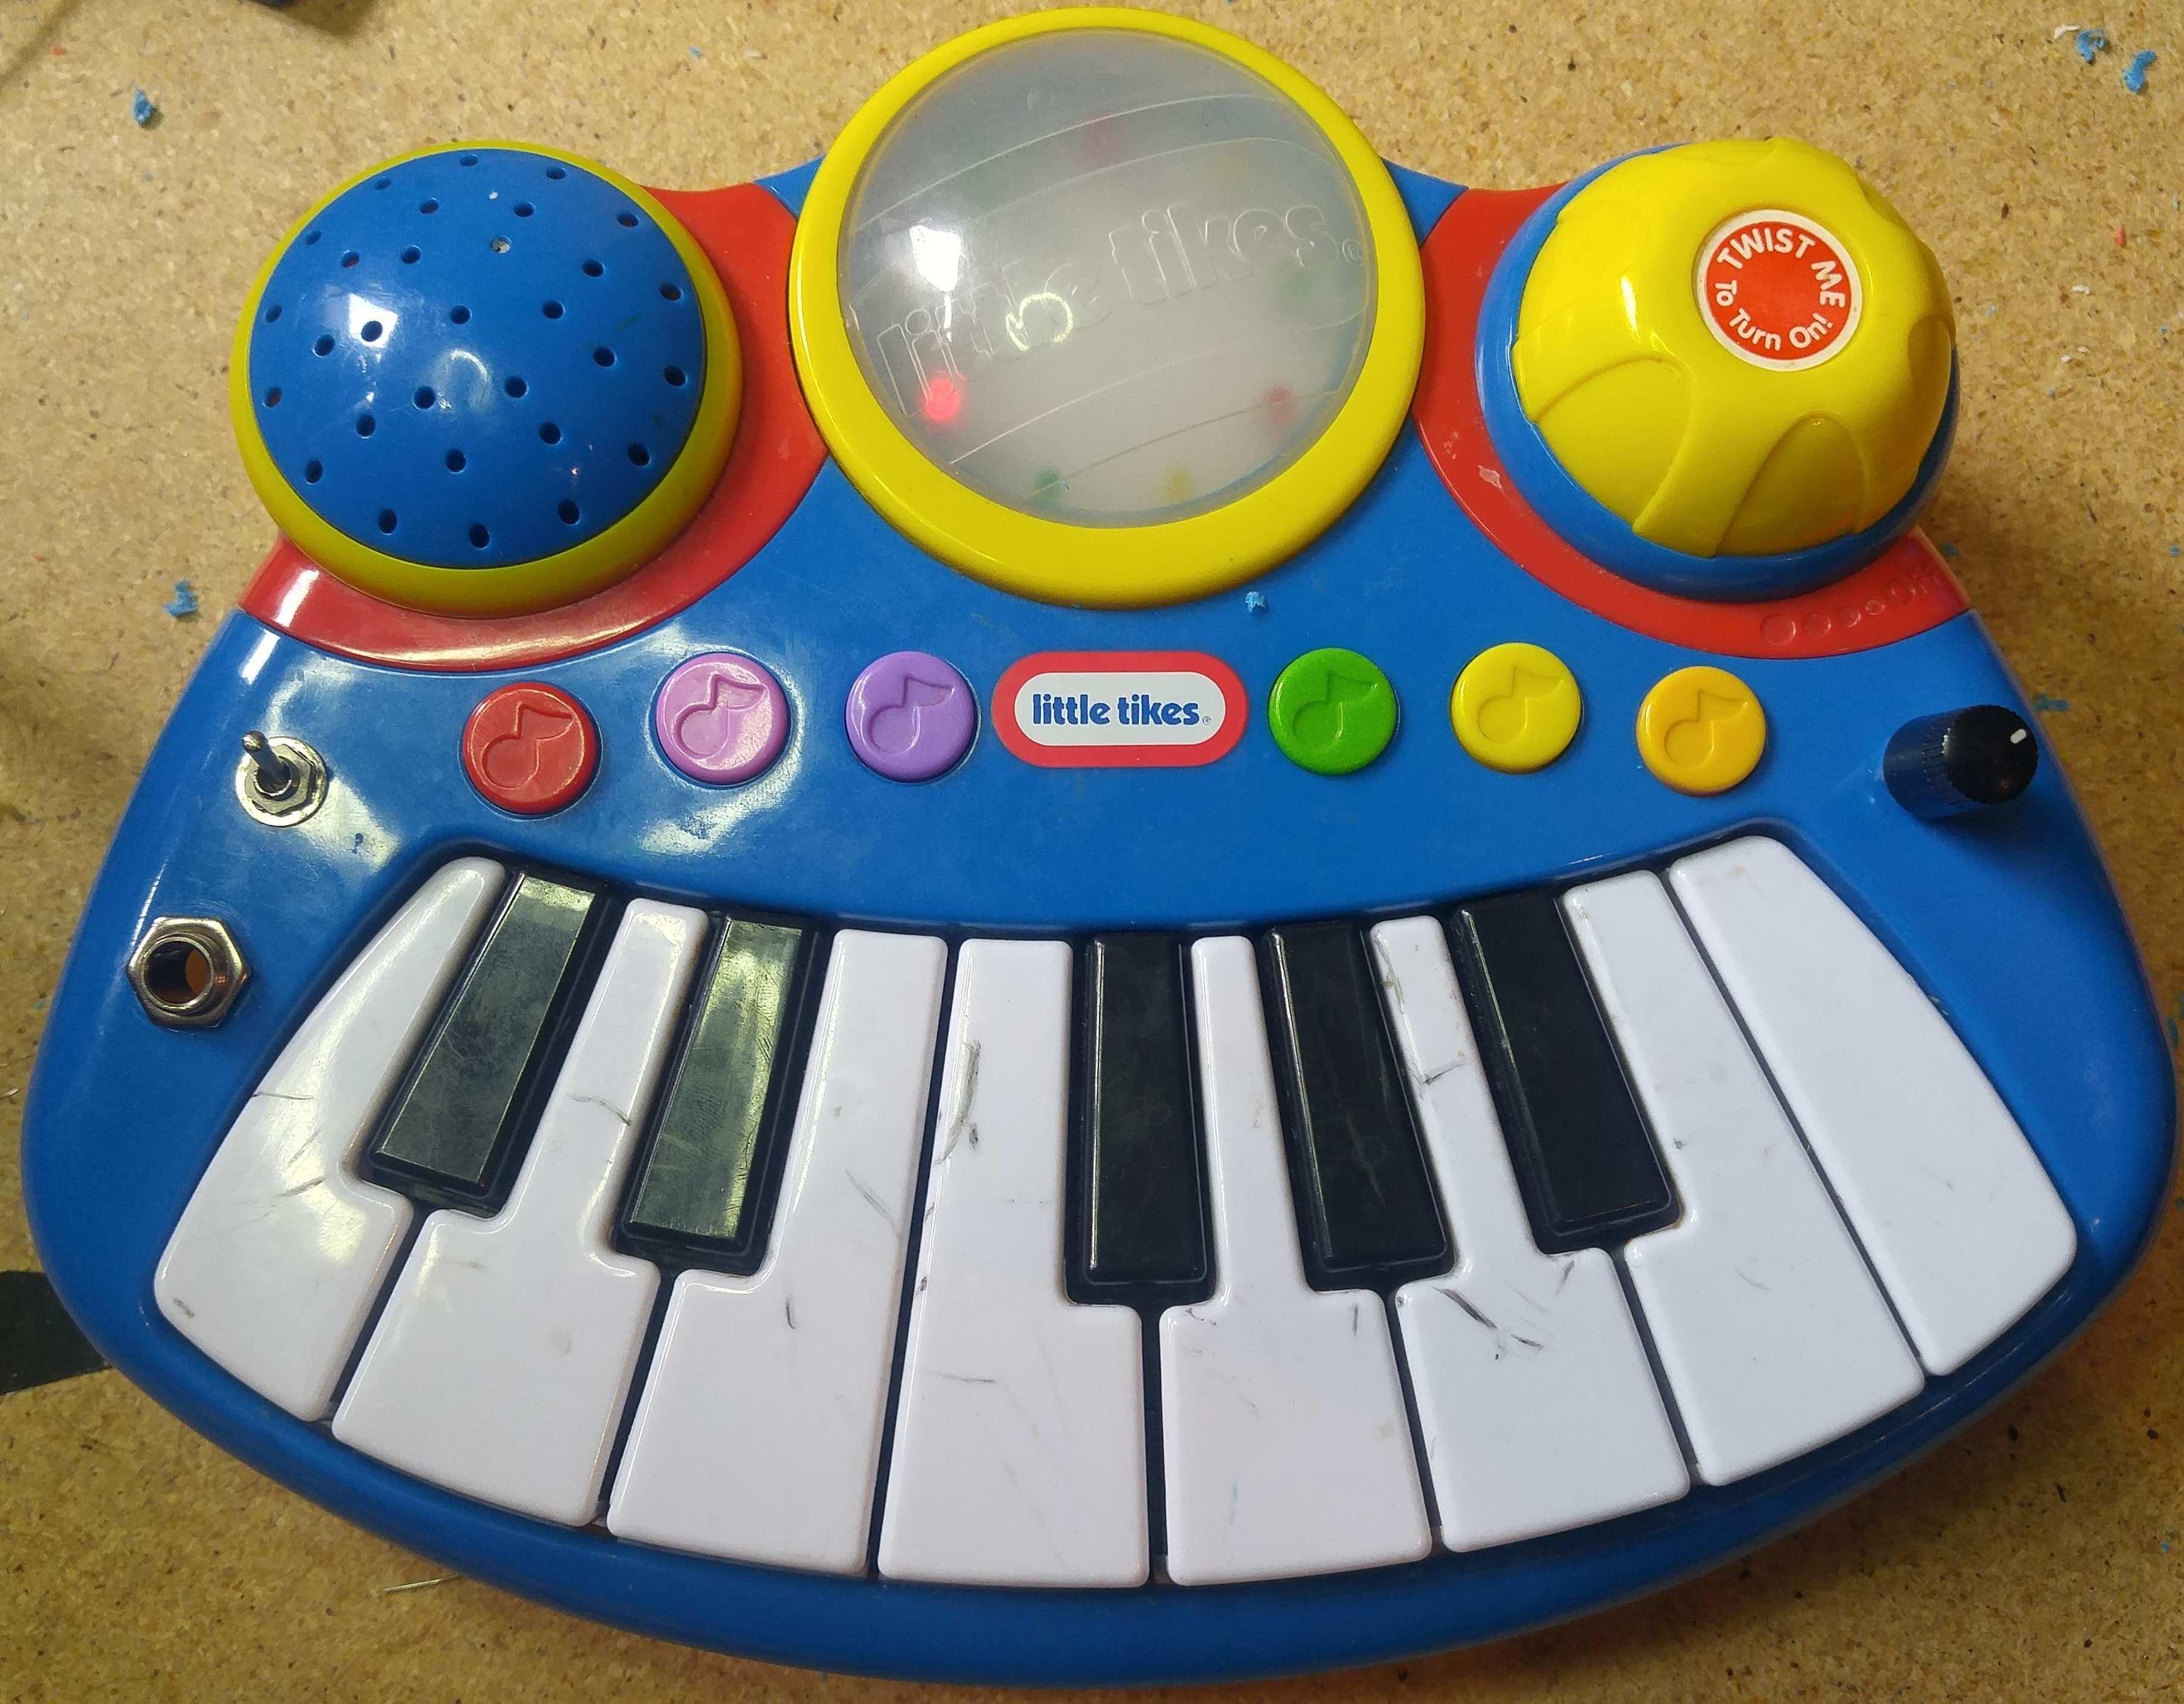 Basic Bends Little Tikes Pop Tunes Keyboard Sam Vs Sound